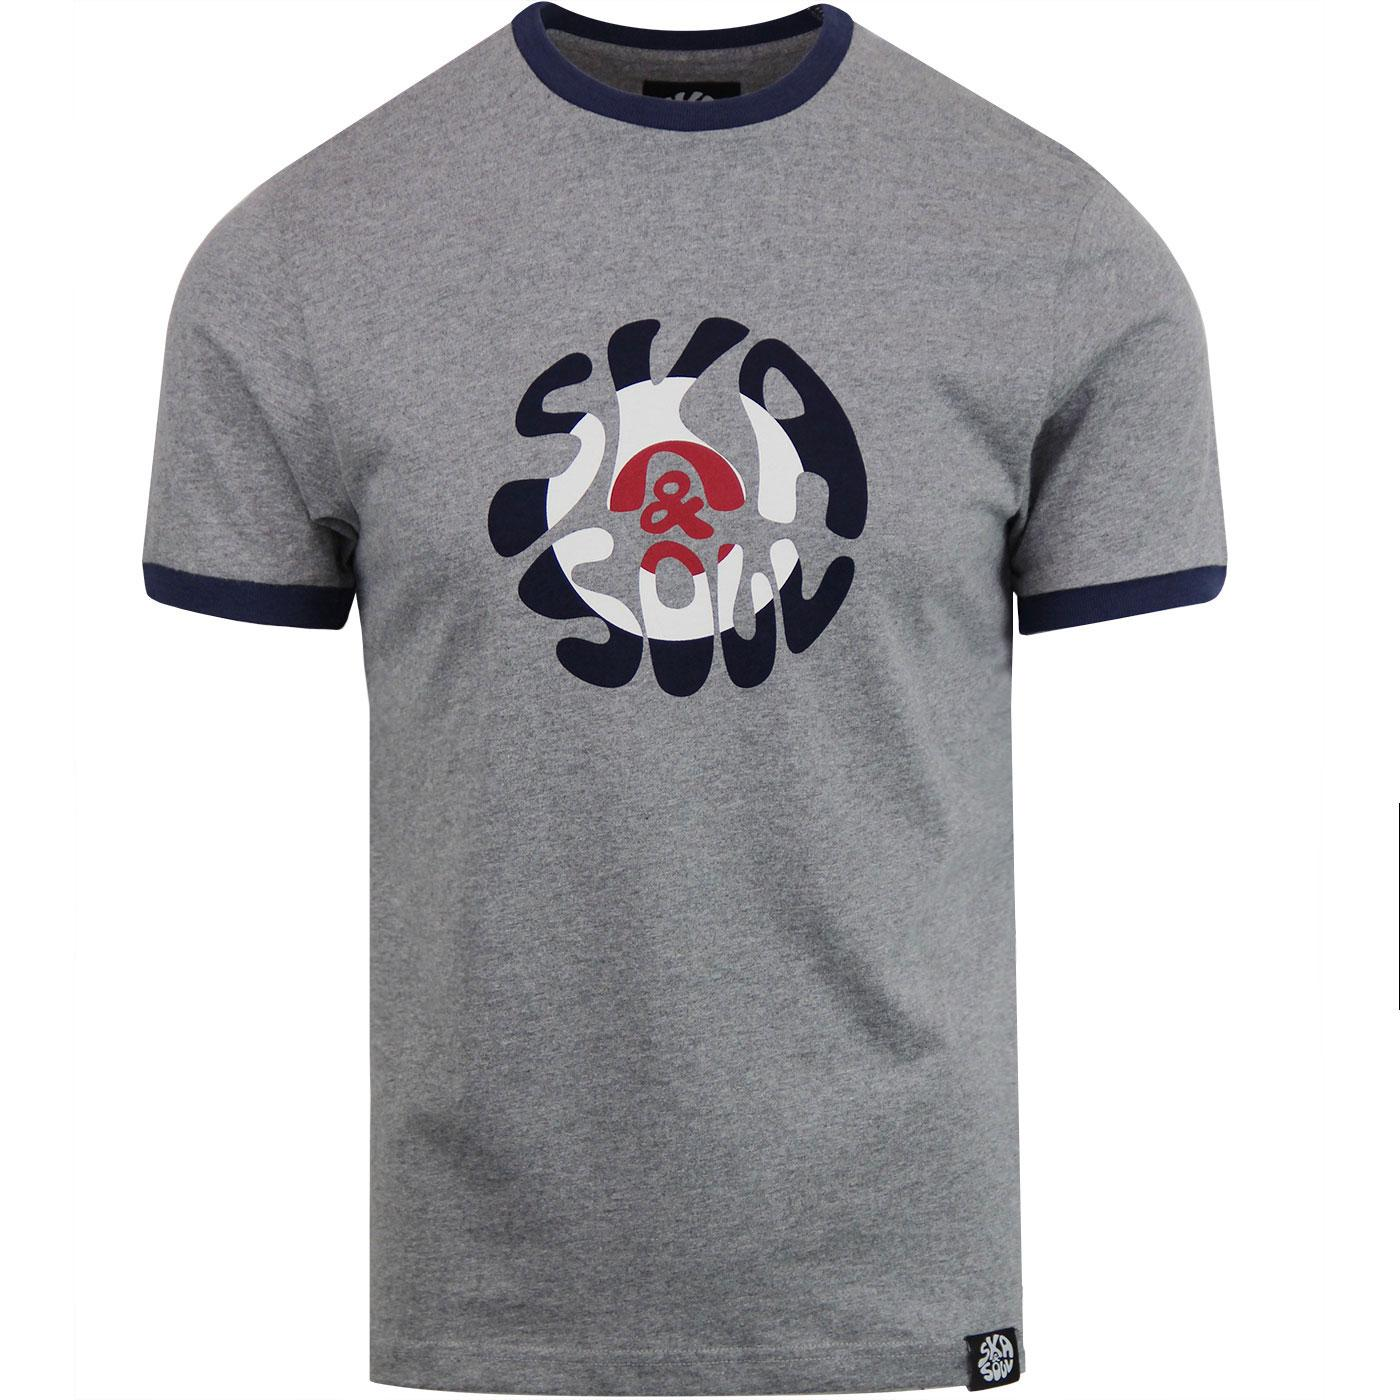 SKA & SOUL 60's Mod Target Logo Ringer Tee - Grey